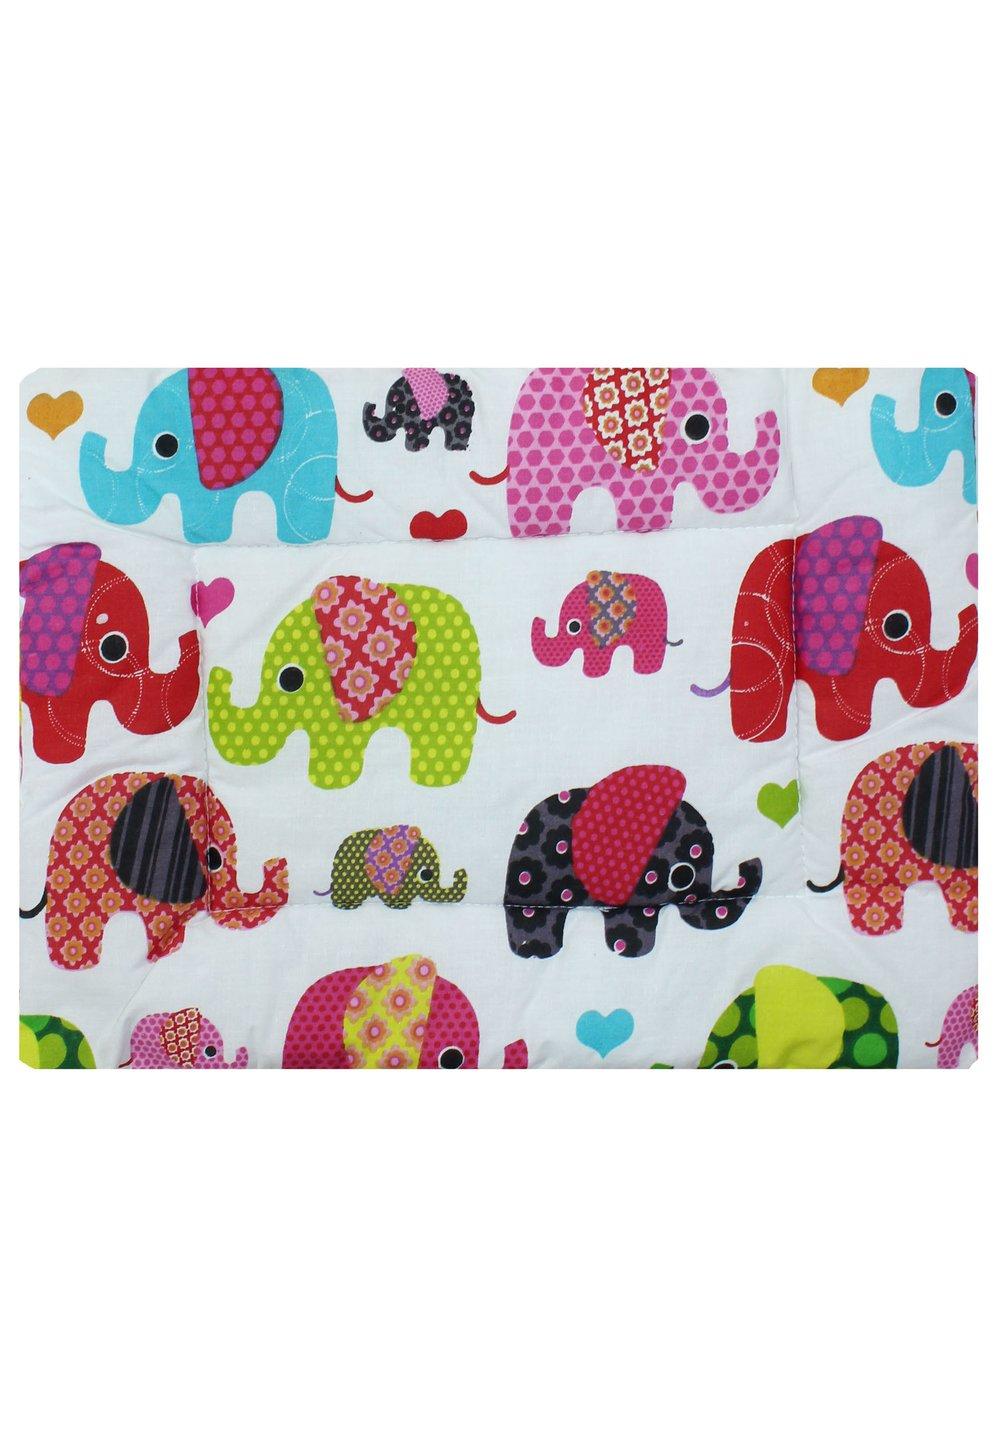 Perna slim, elefantei roz, 37x28cm imagine